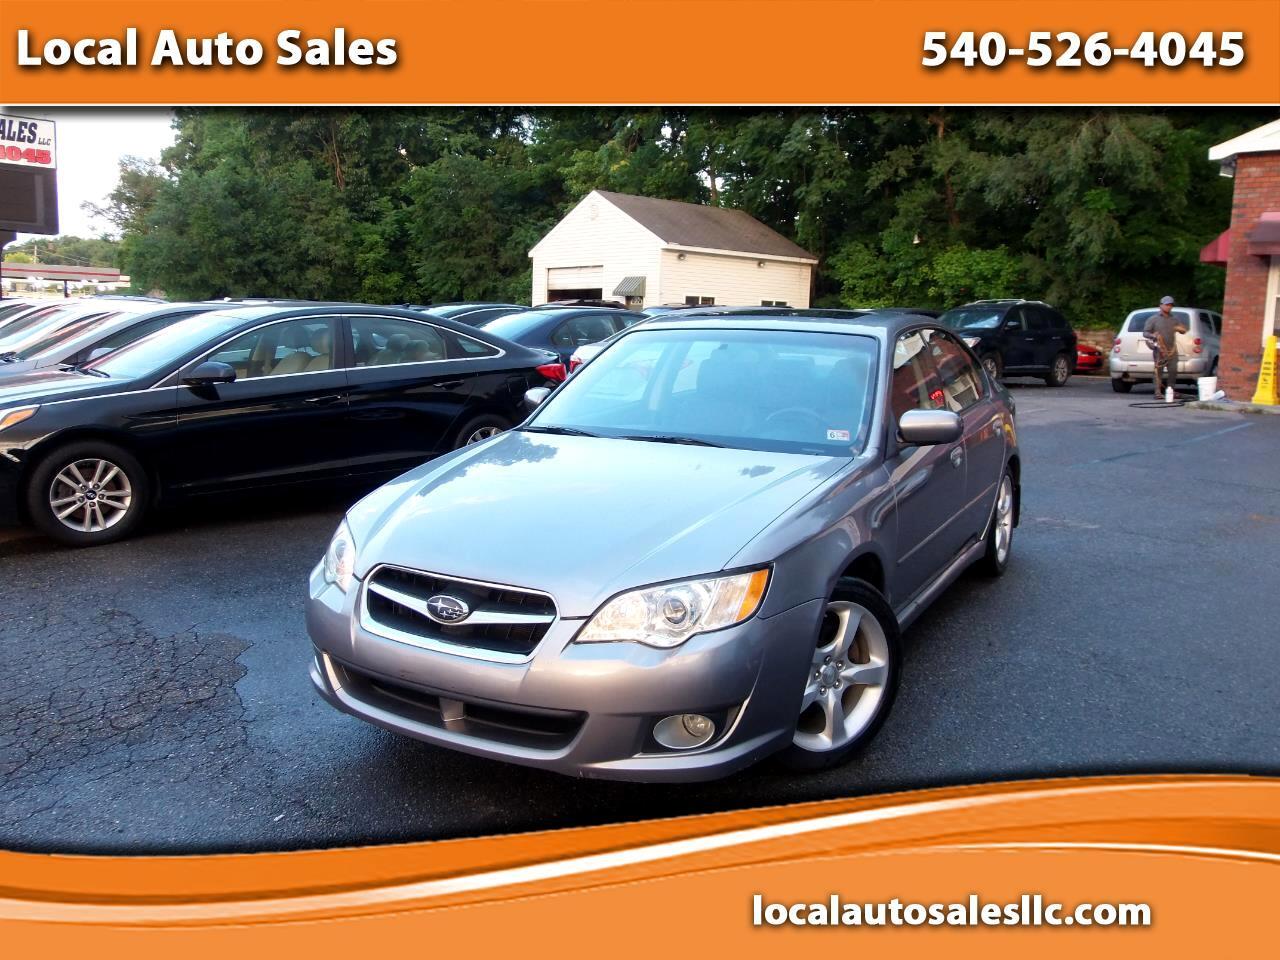 Subaru Legacy (Natl) 4dr H4 Auto Ltd 2008